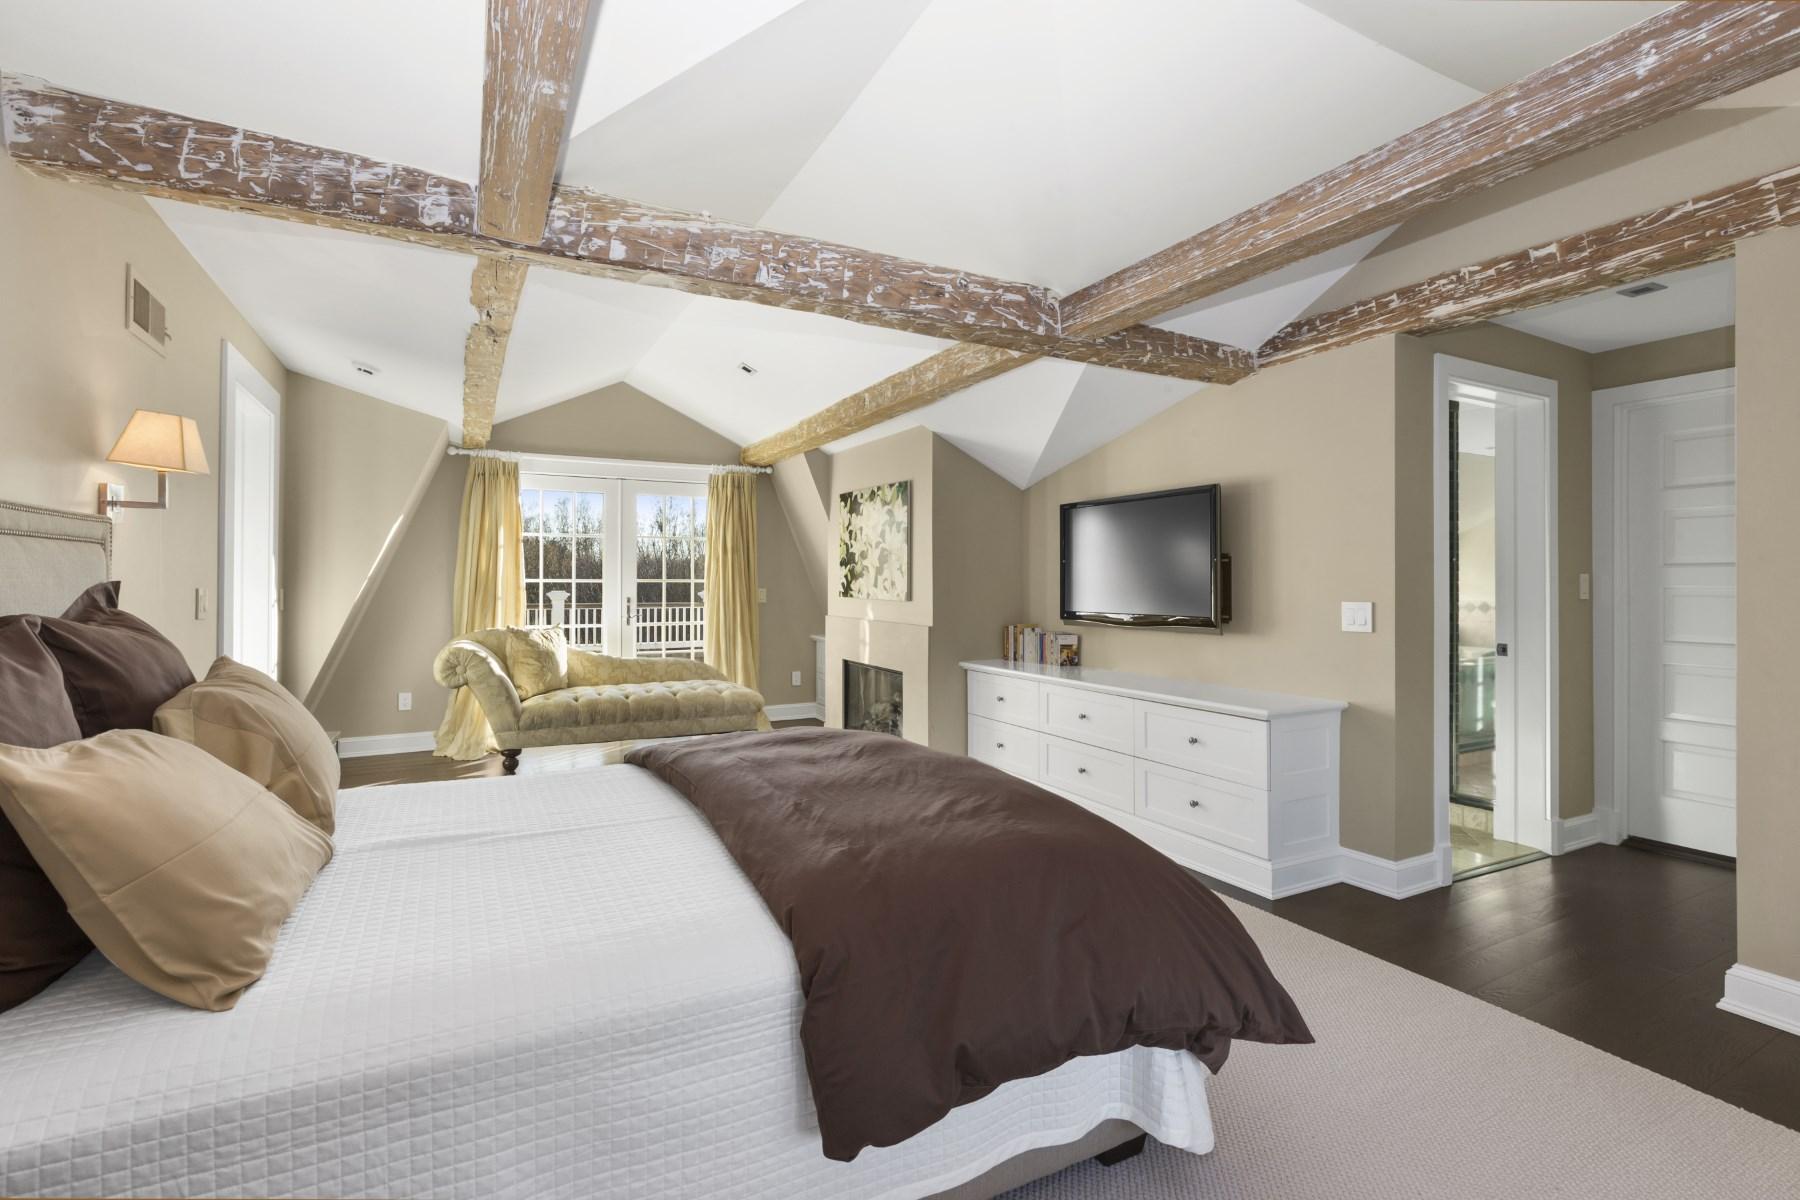 Property Of Stylish and Private, Southampton Village